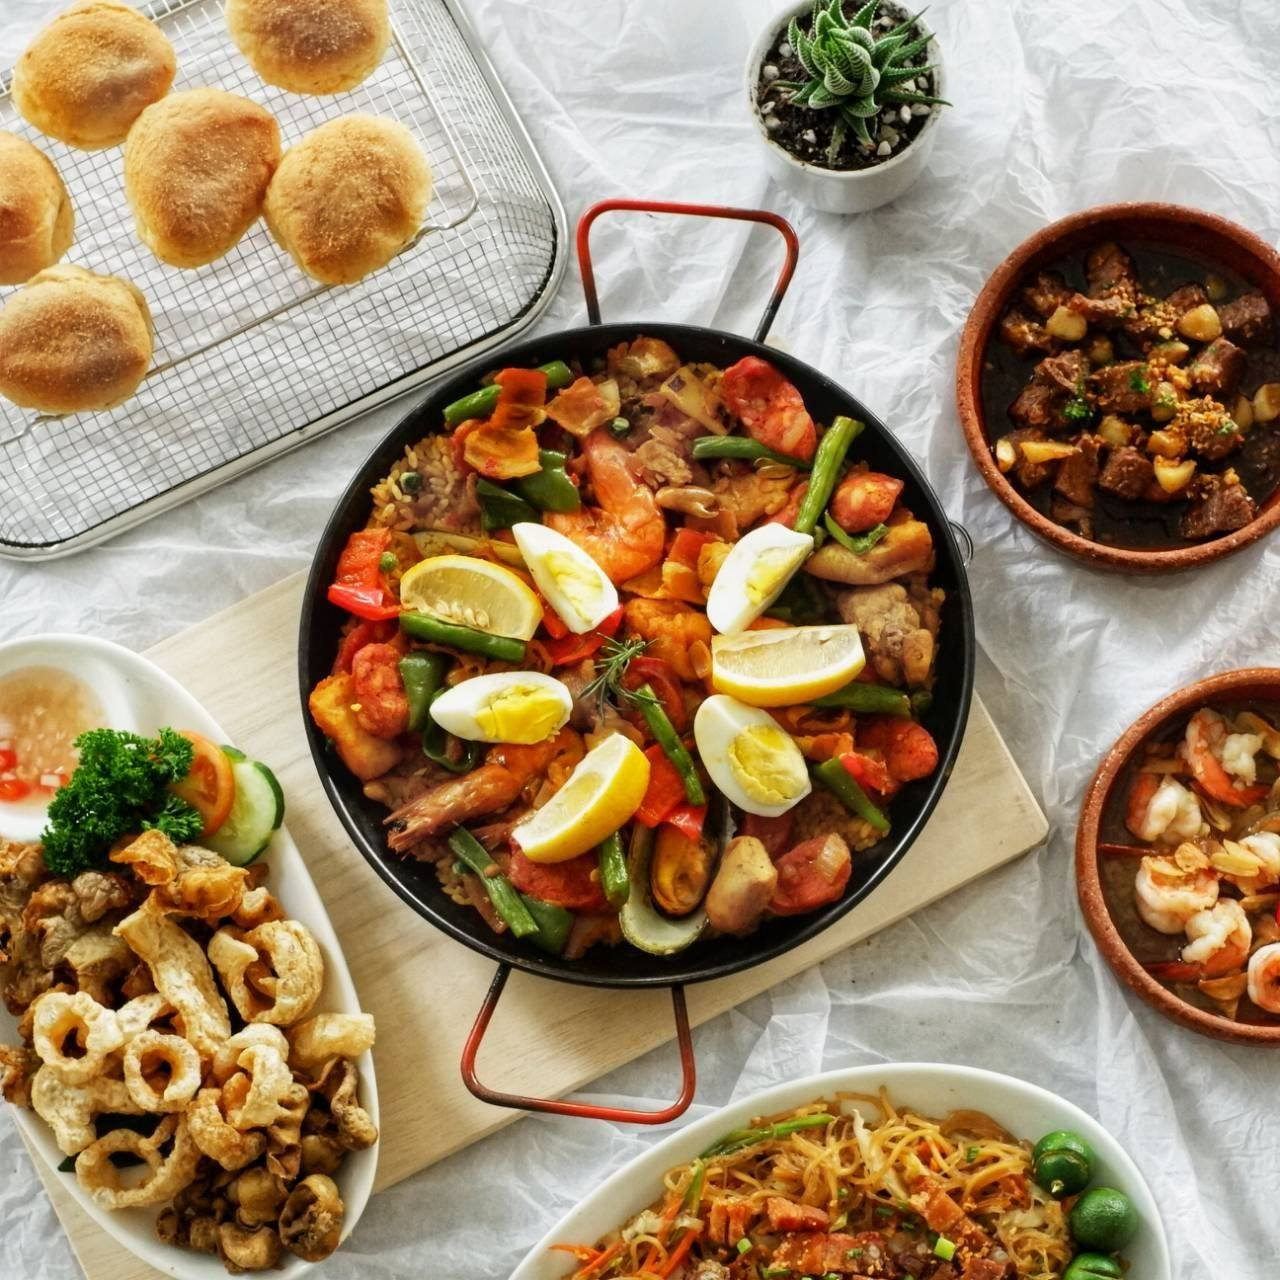 Corazon Filipino Hispano Cuisine Image